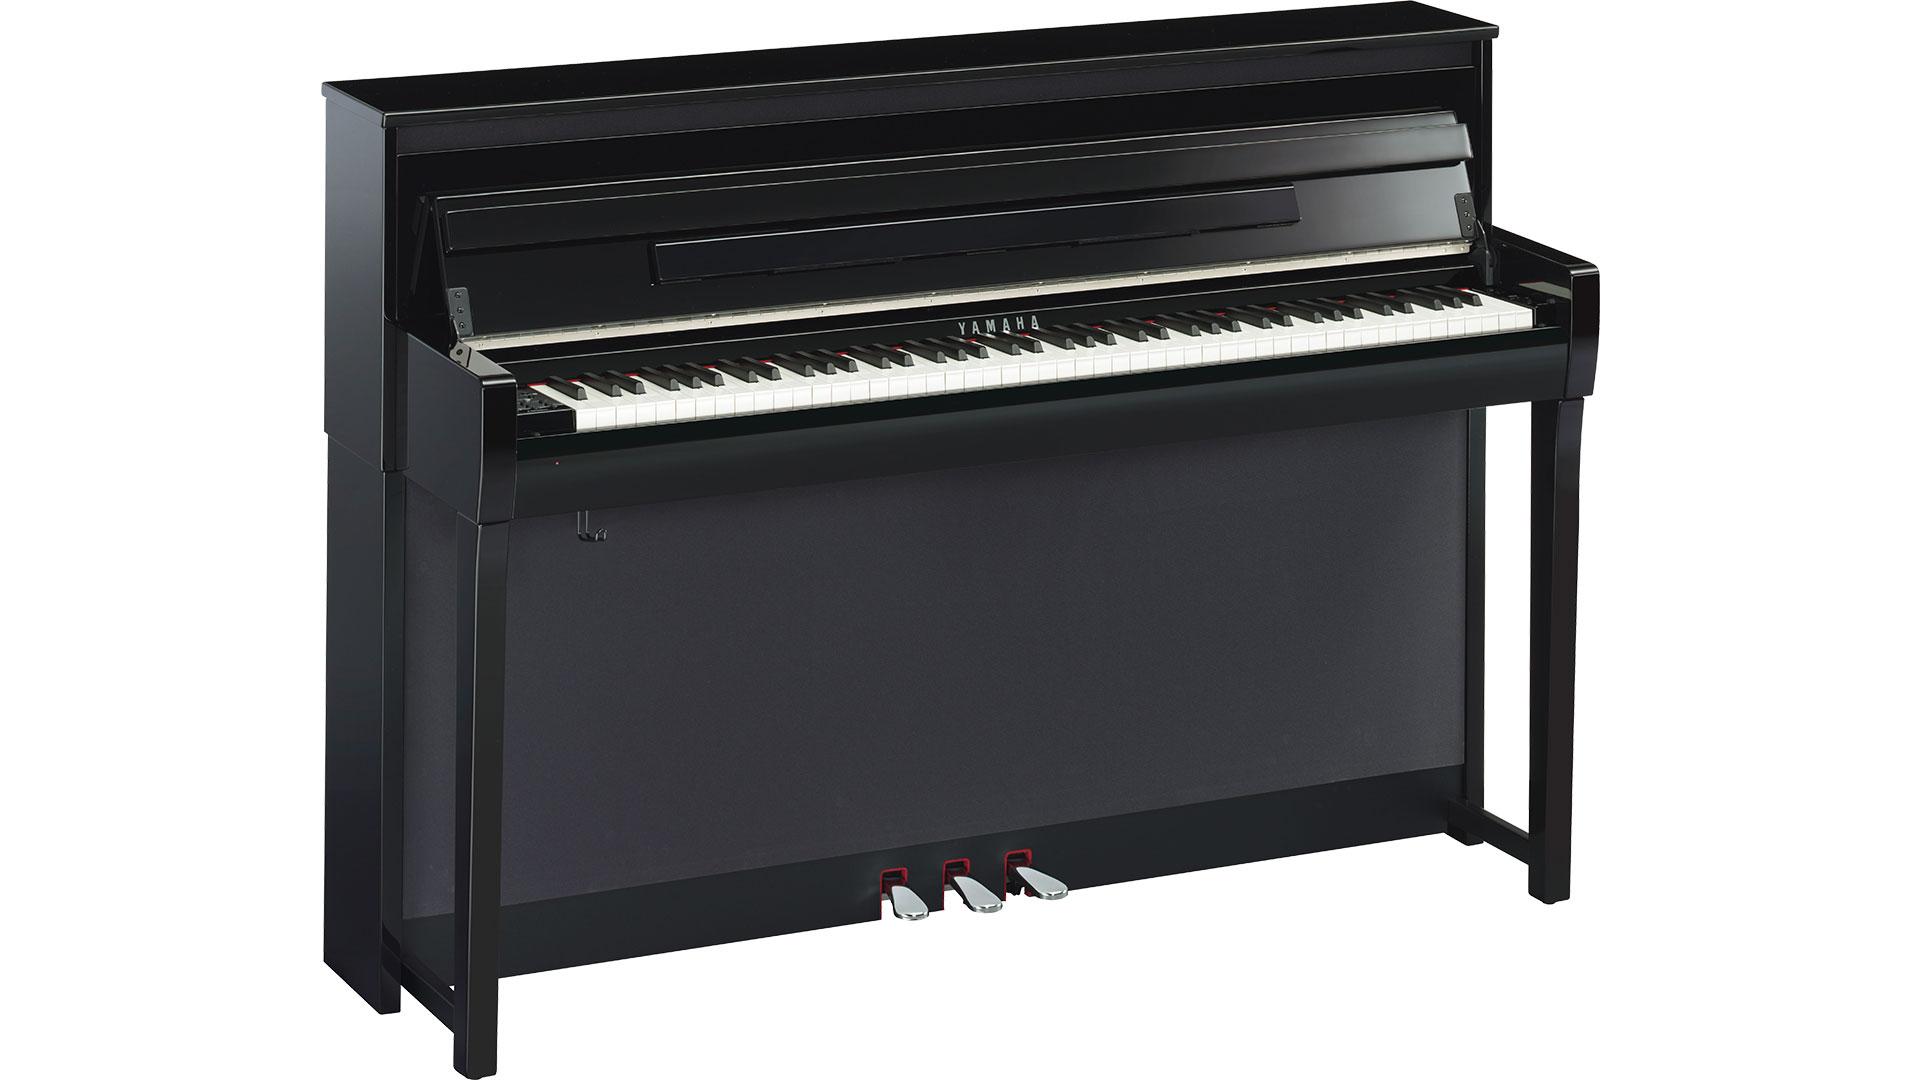 clp 685 yamaha clavinova digital piano buy online yamaha digital pianos electronic piano. Black Bedroom Furniture Sets. Home Design Ideas